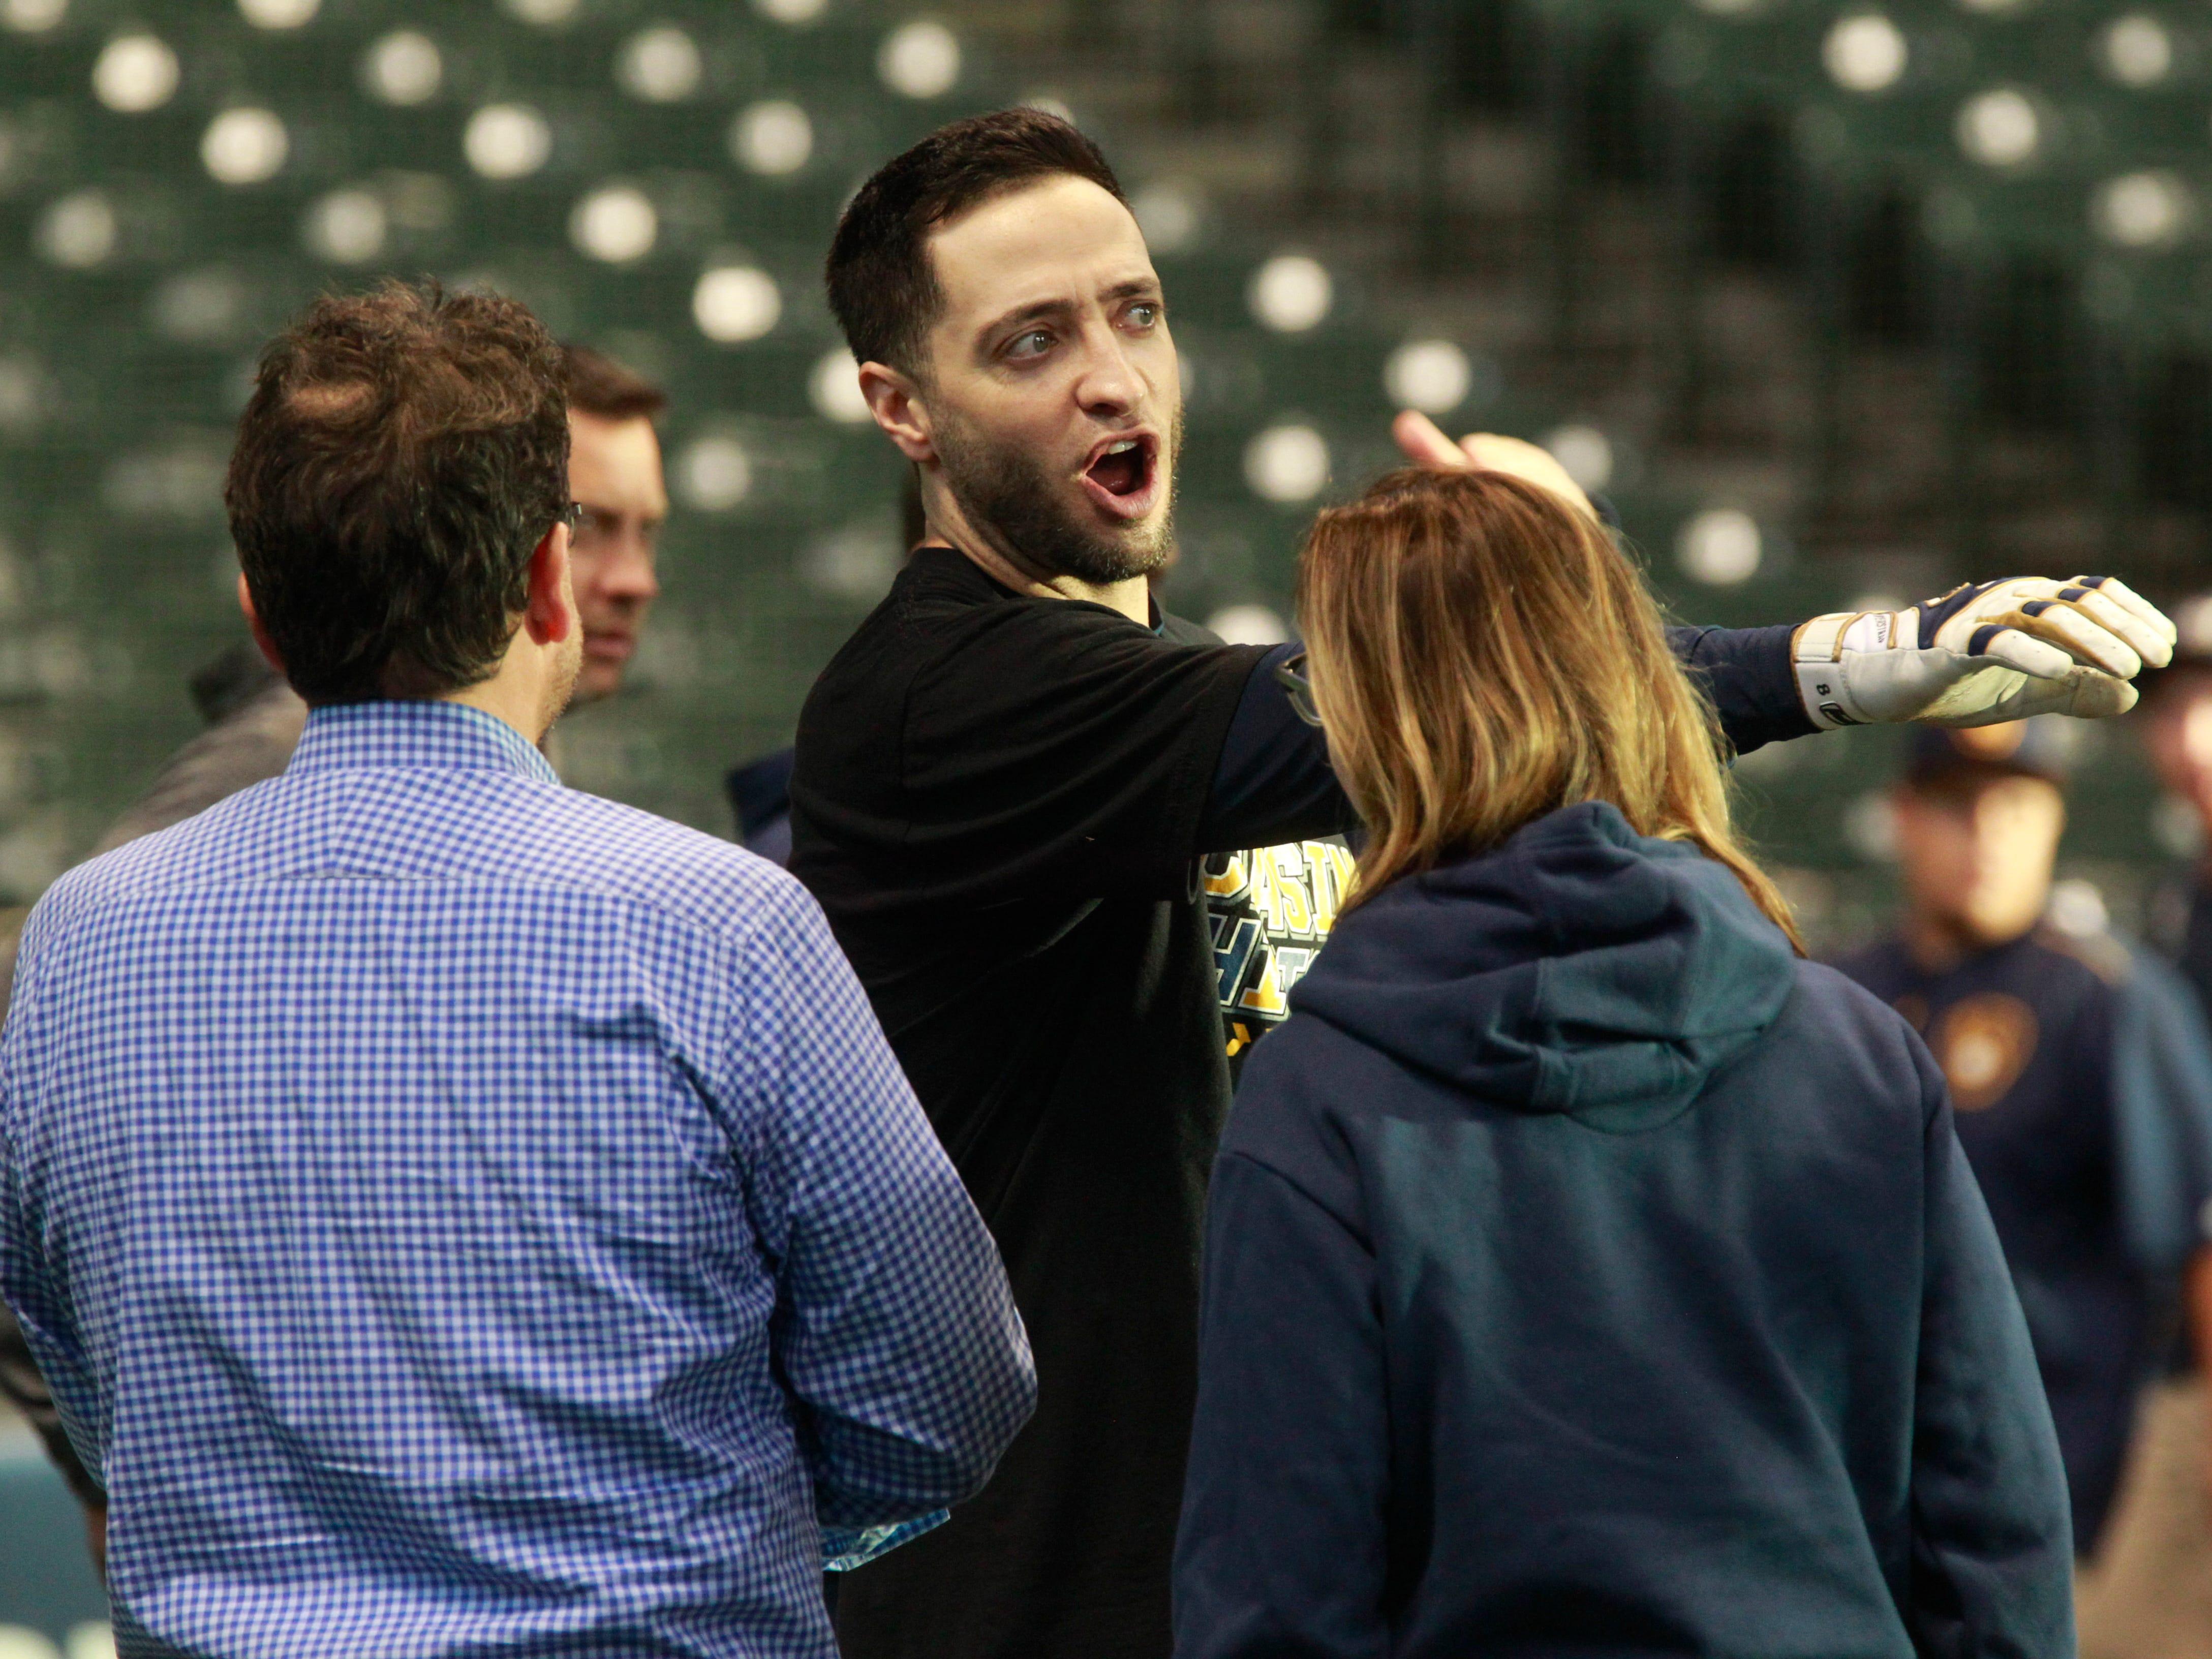 Brewers veteran outfielder Ryan Braun talks with team owner Mark Attanasio (left) during practice on Wednesday at Miller Park.